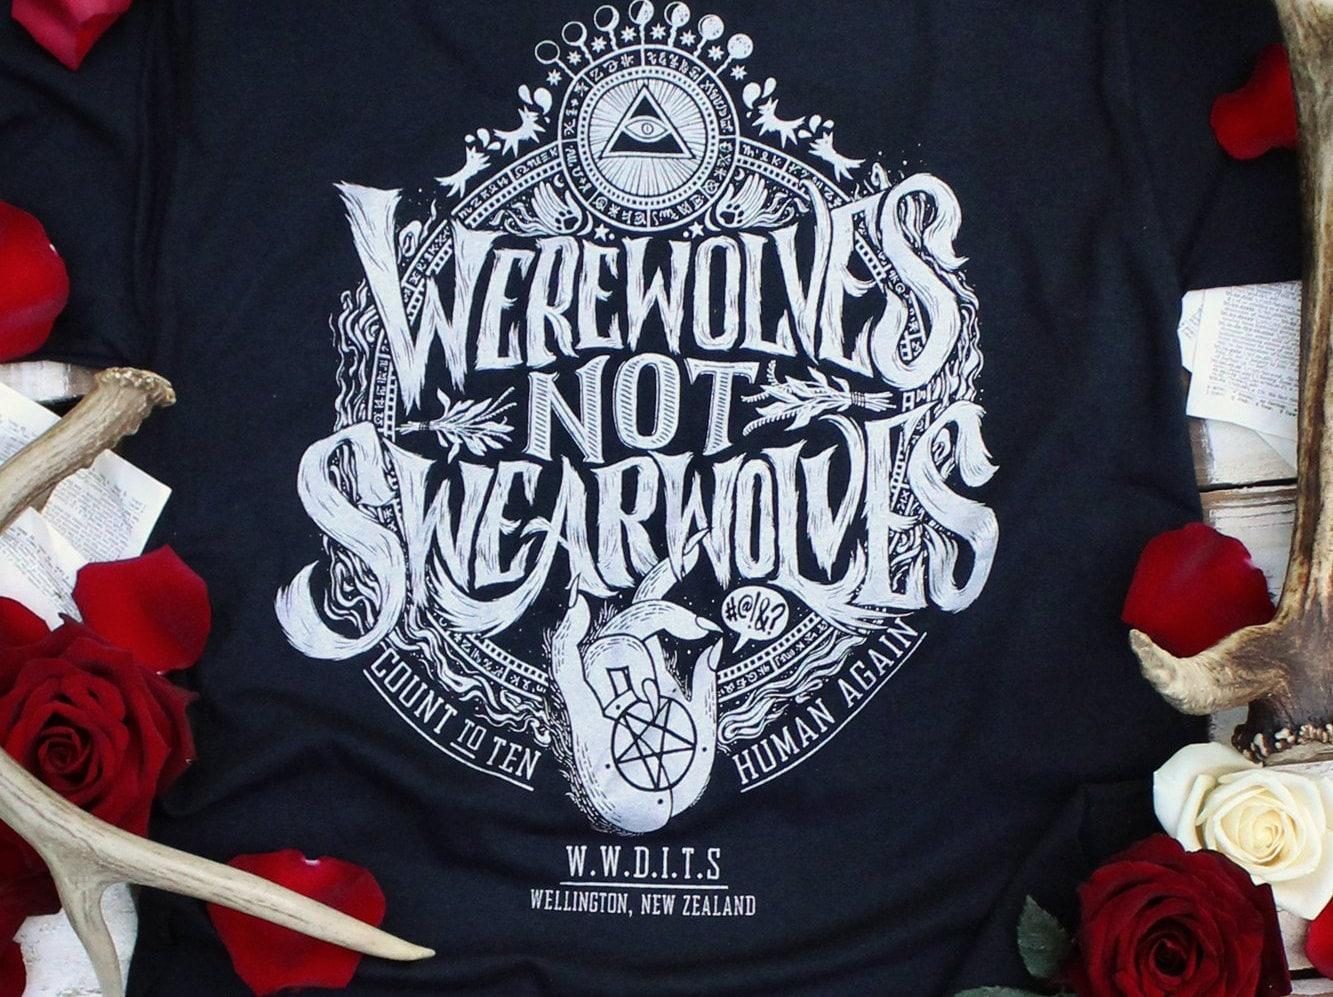 2680eb3ad Printed T Shirts Wellington Nz - raveitsafe